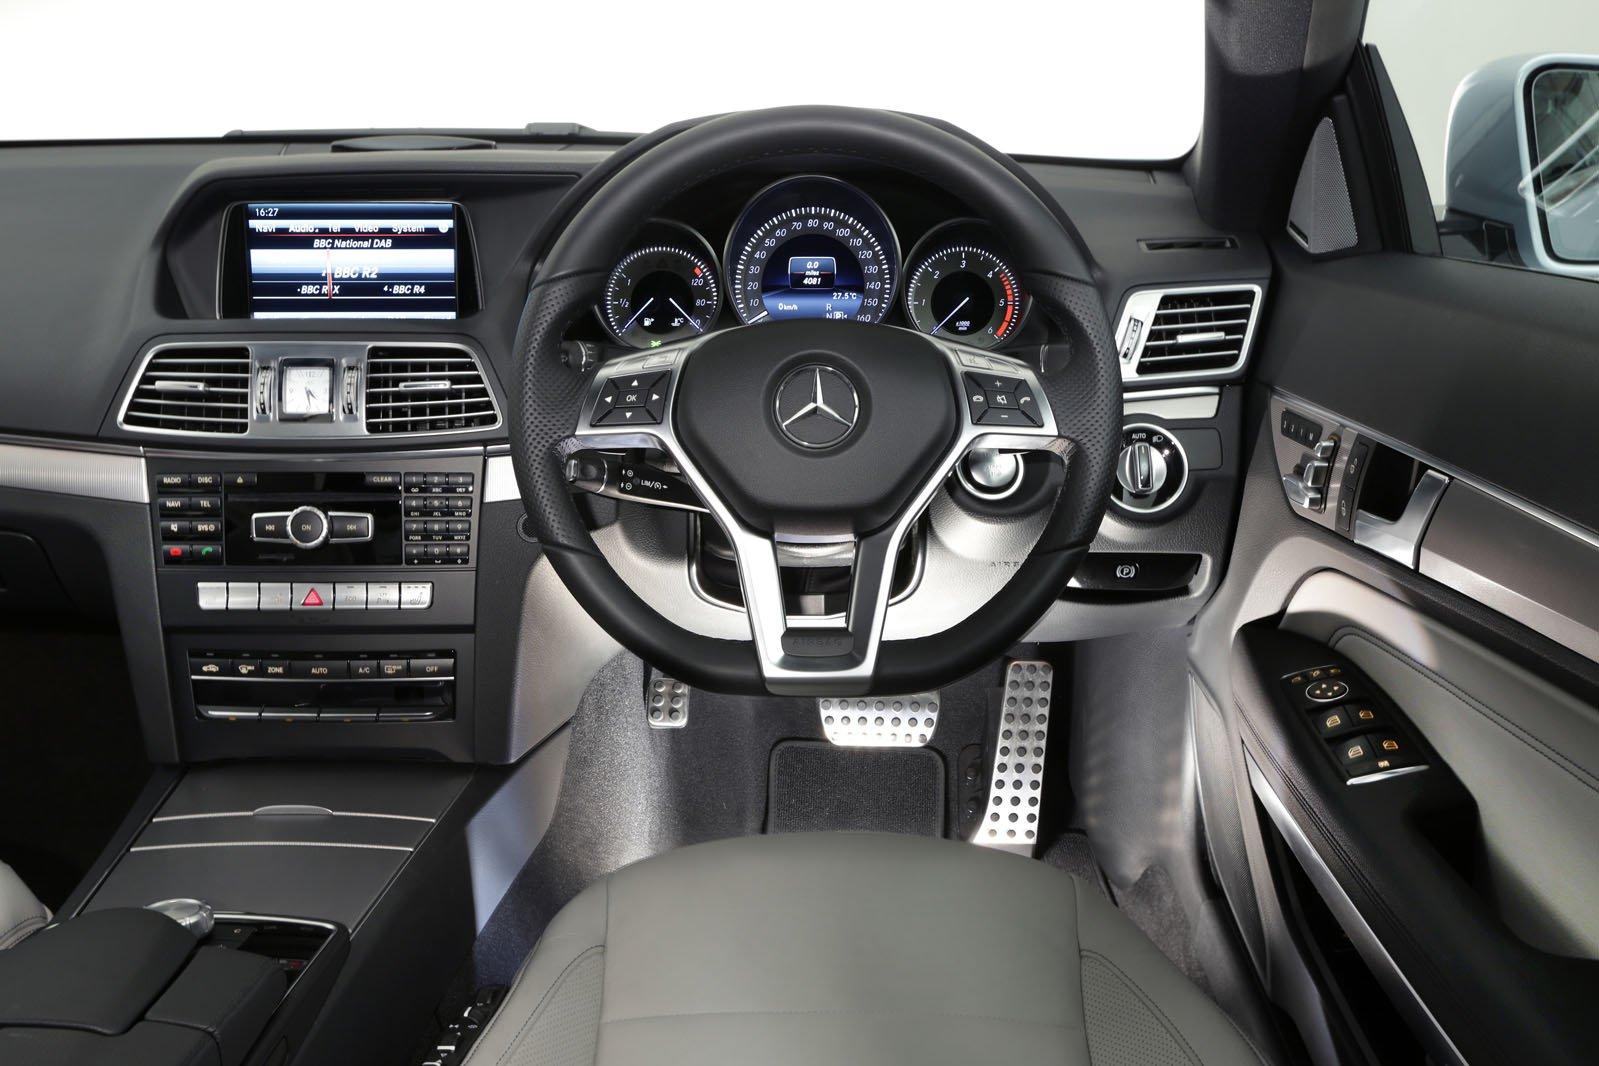 Used Mercedes E-Class Coupe 2009-2017